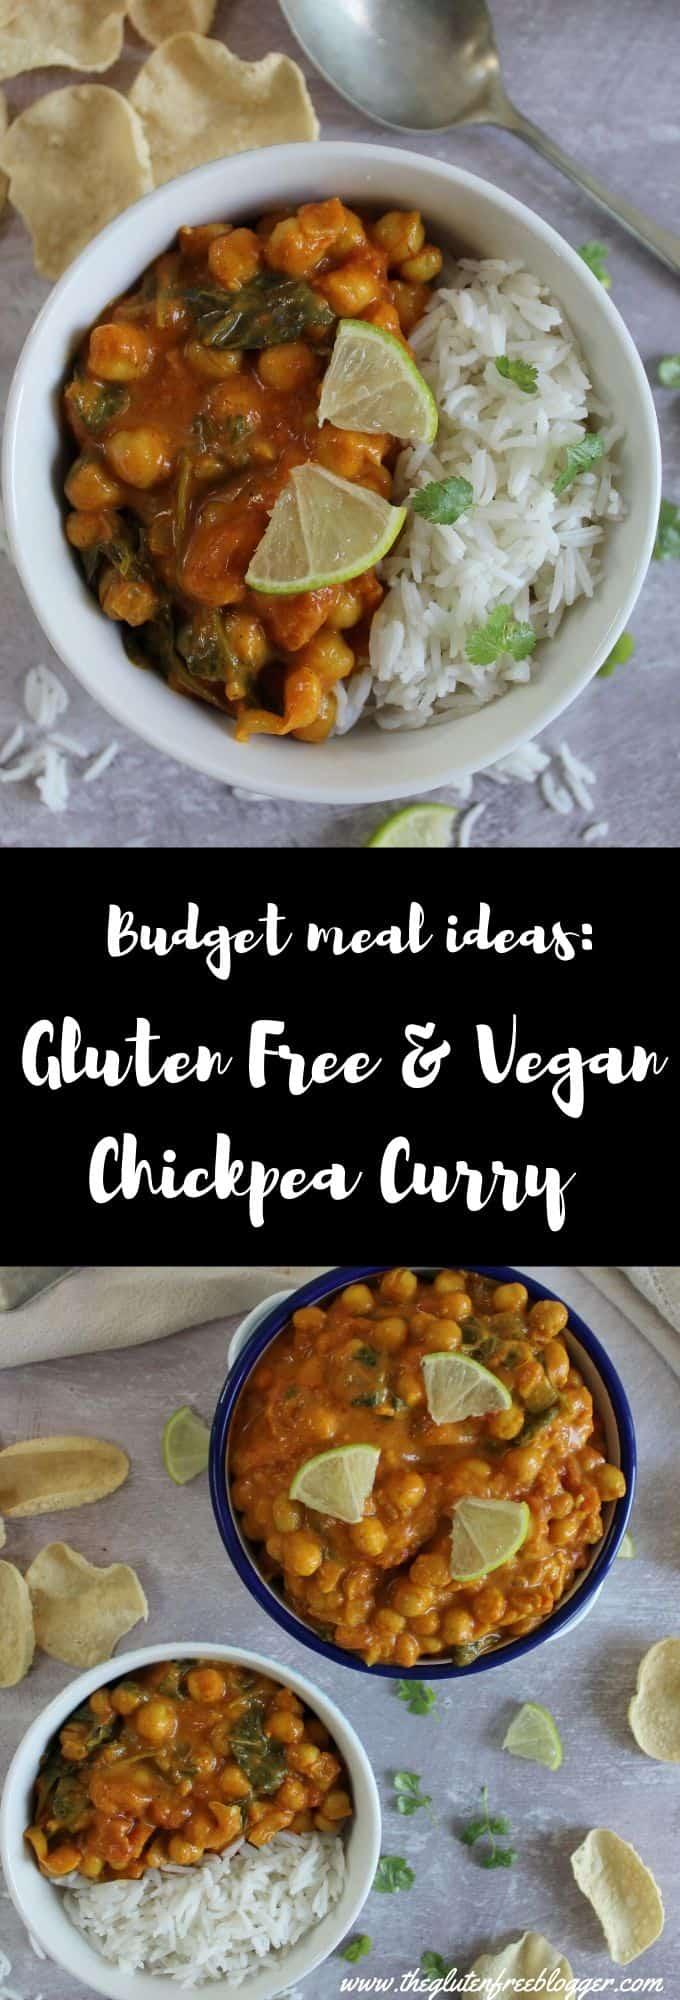 gluten free and vegan chickpea curry recipe easy budget meal ideas coeliac celiac veganuary cheap dinner